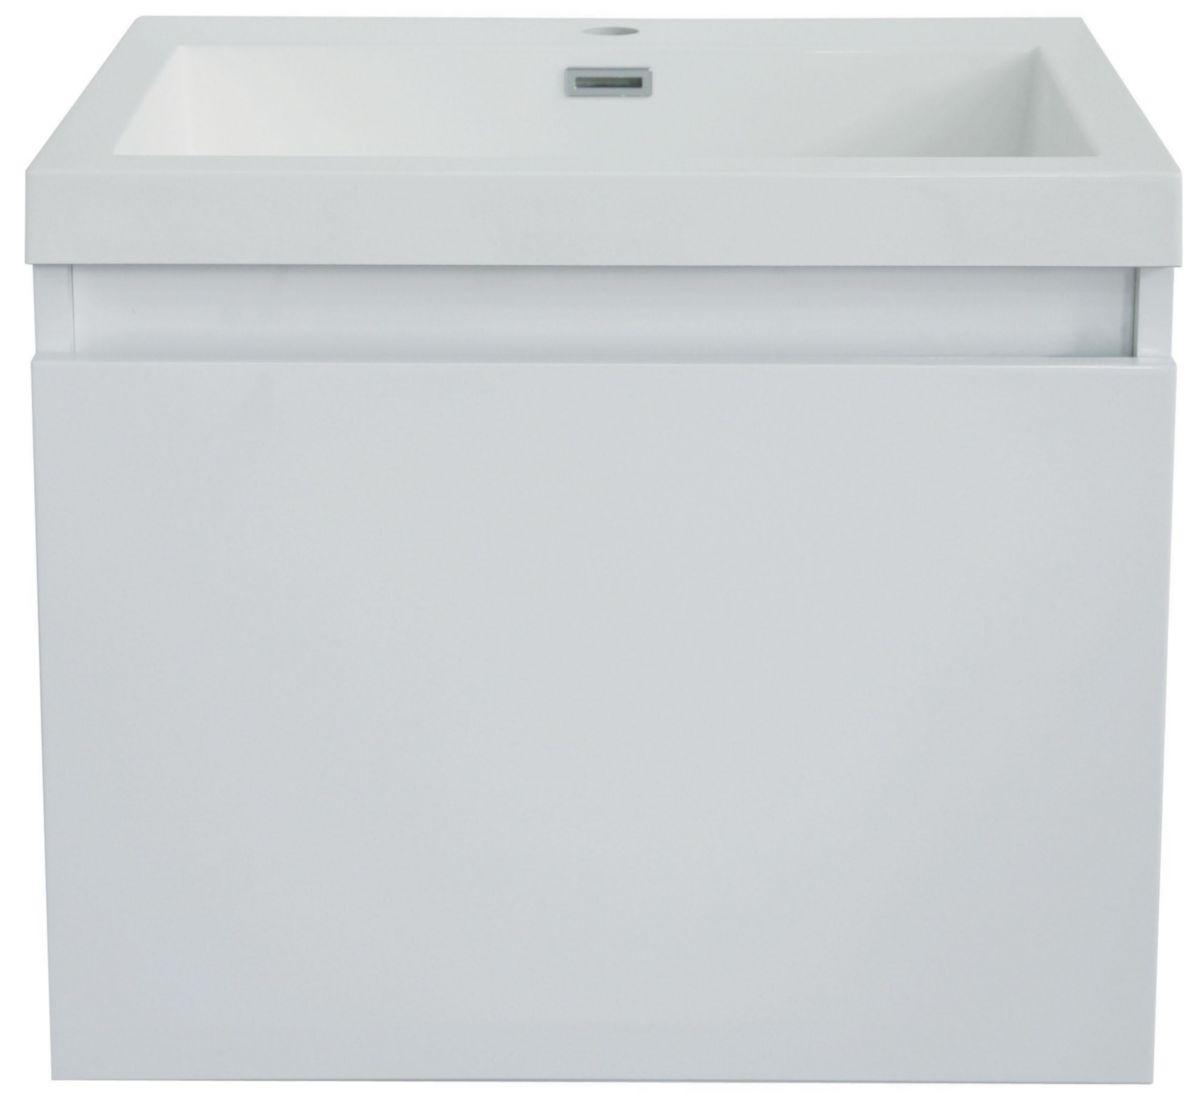 Meuble Salle De Bain Tiroir Suspendu ~ meuble primeo 60 cm suspendu 2 tiroirs blanc alterna sanitaire